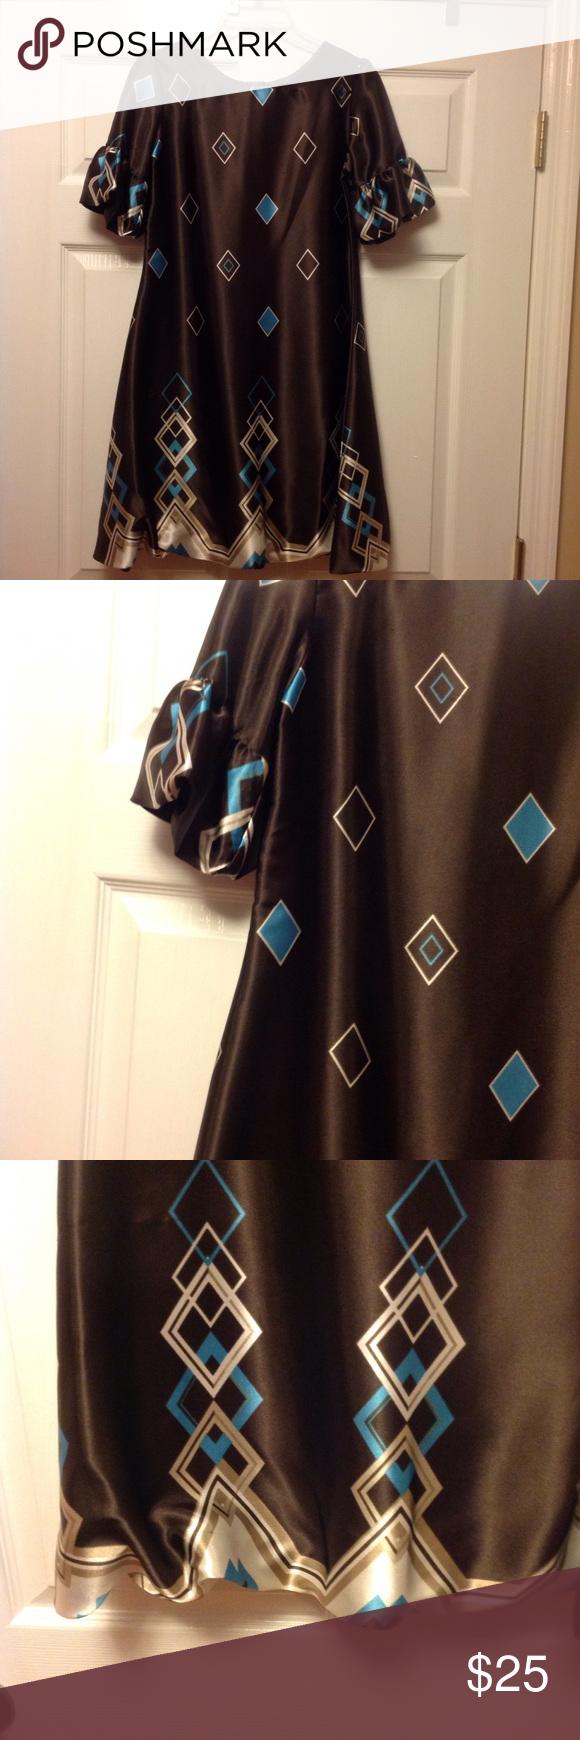 Dark brown dress nice dress with minimal wear good condition